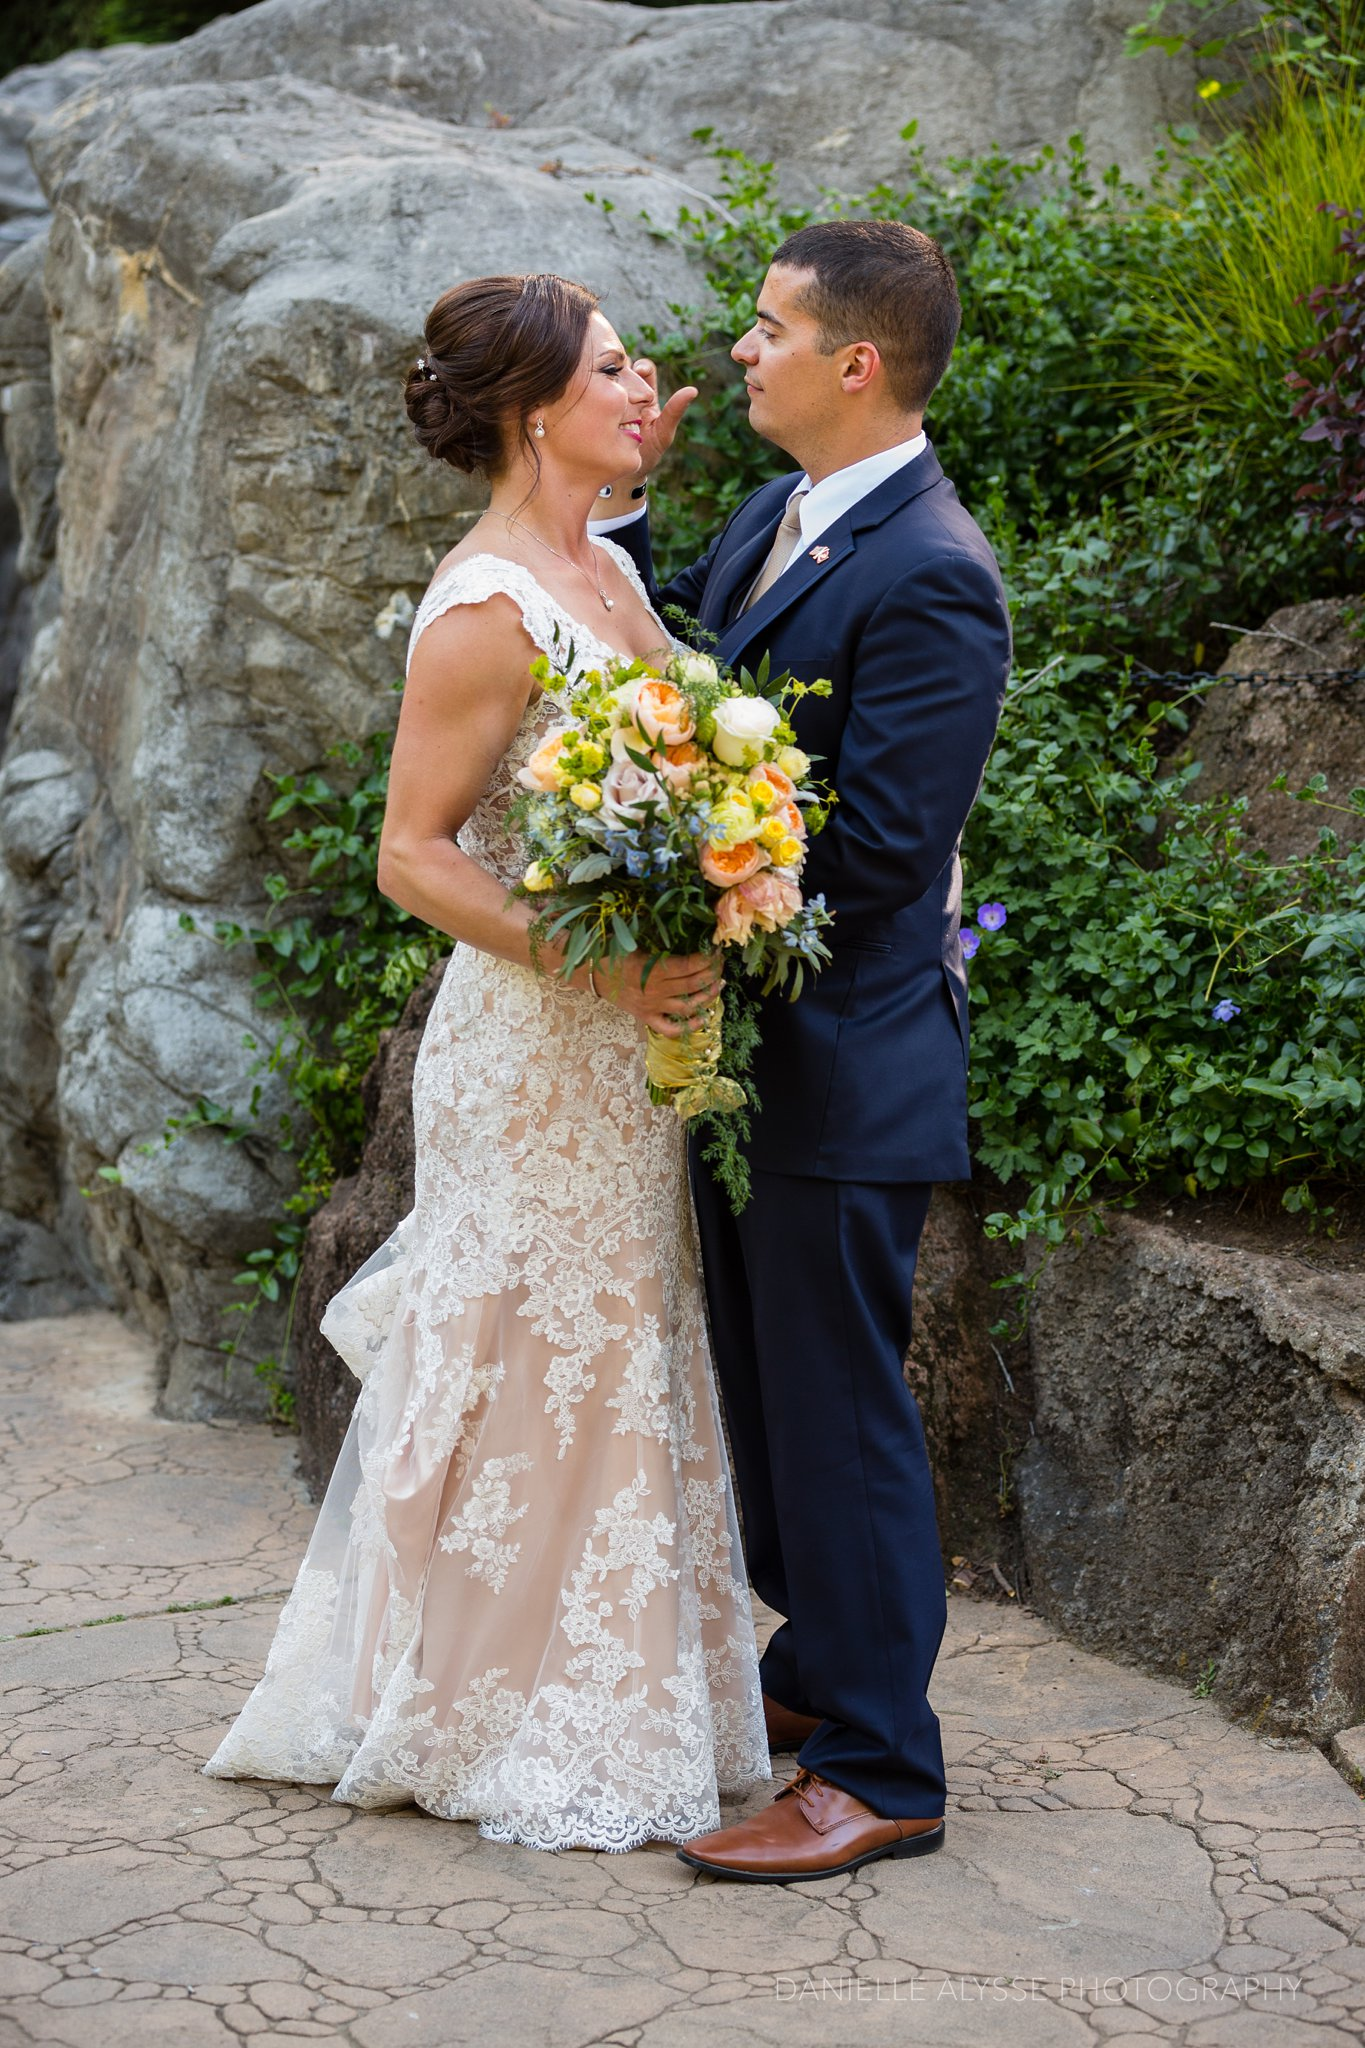 170429_blog_kimberly_ben_wedding_san_mateo_curiodyssey_danielle_alysse_photography_sacramento_photographer0381_WEB.jpg